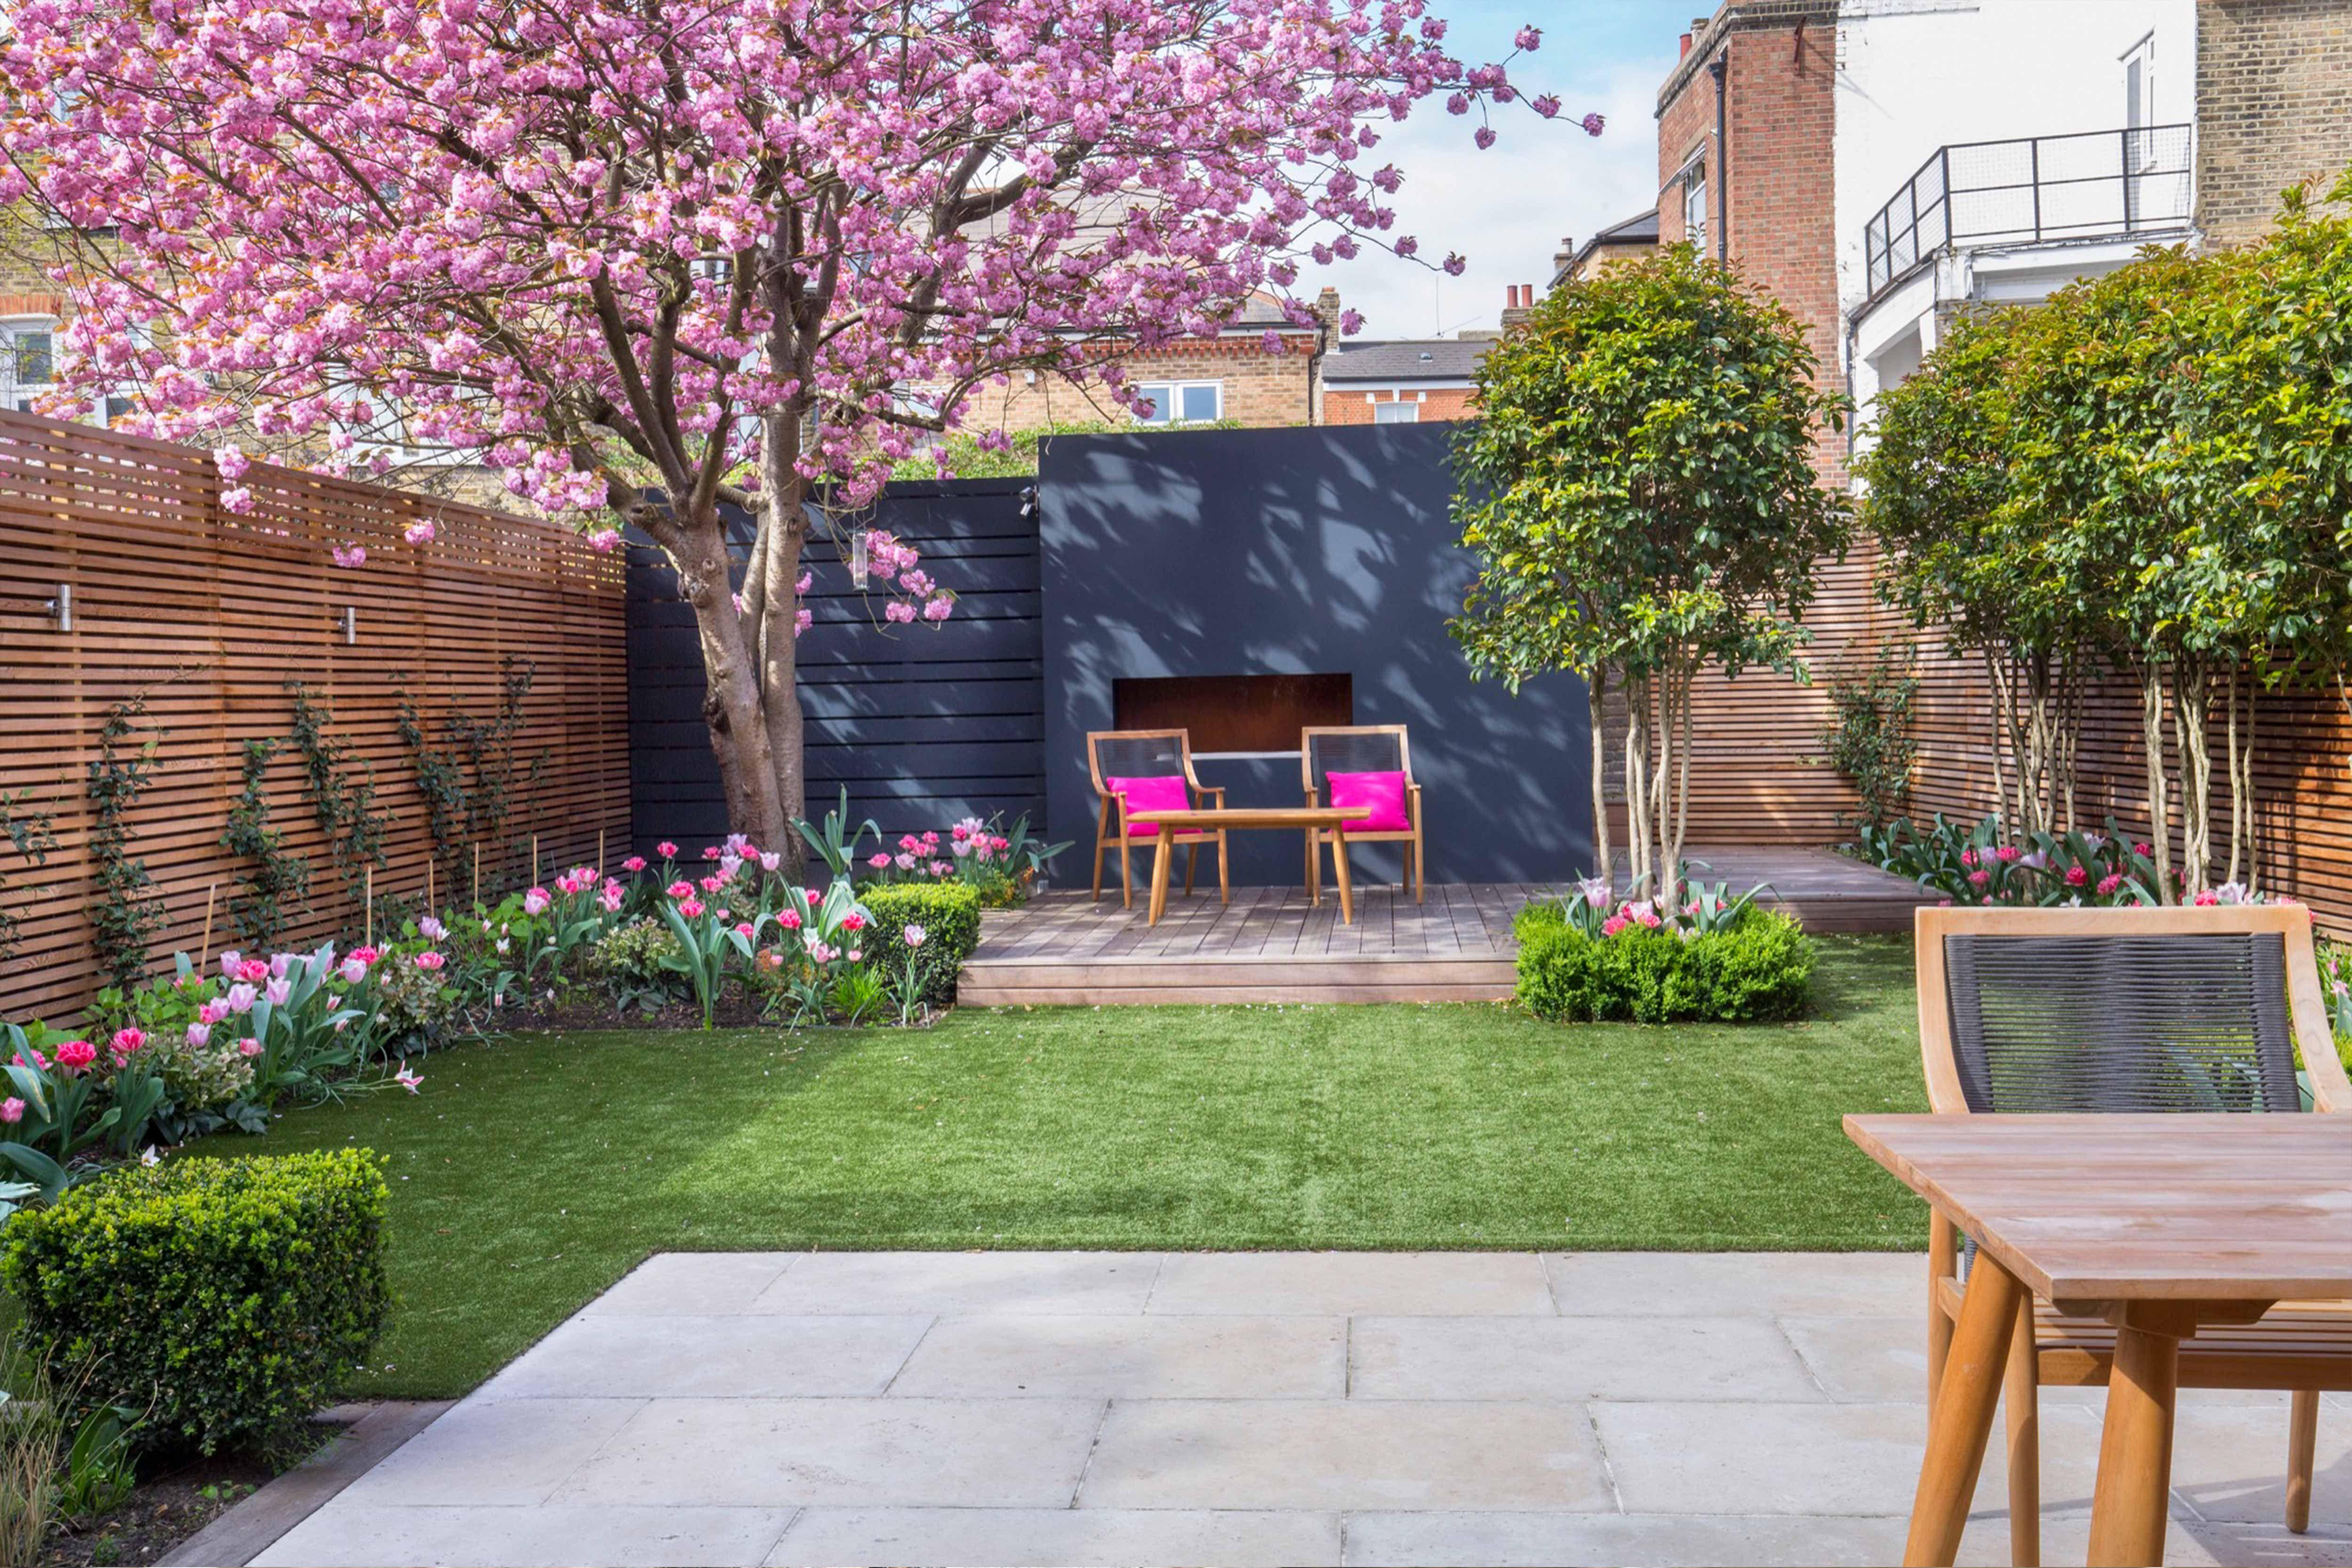 Photo of Clapham – Garden Club London